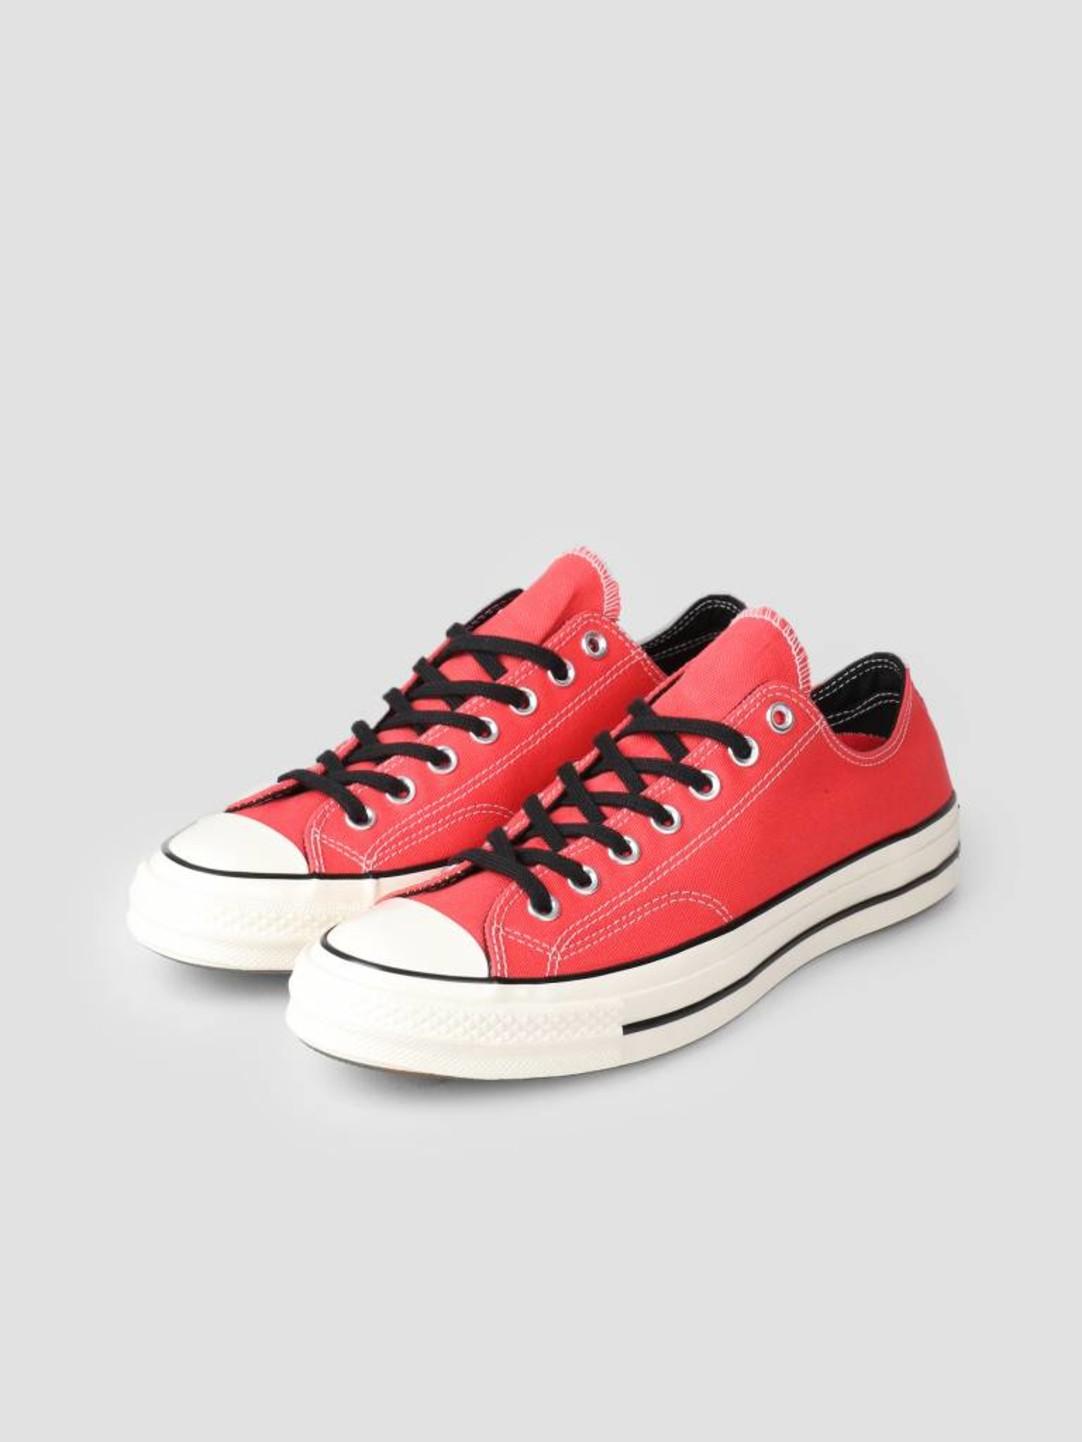 Converse Converse Chuck 70 Ox Sedona Red Black Egret 163335C